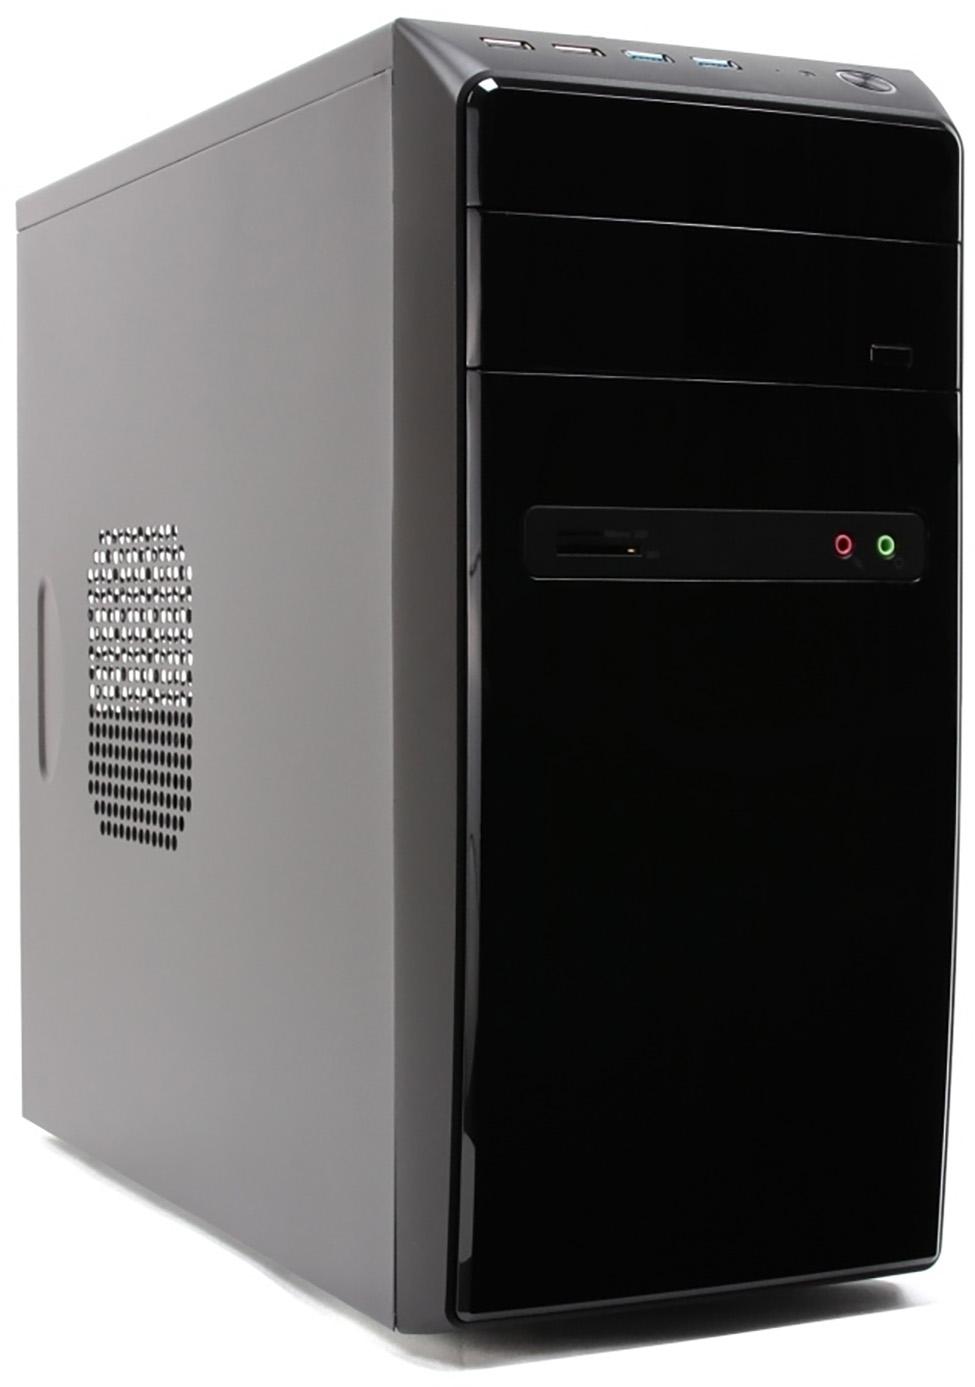 PC- Gehäuse Sohoo 6826 Micro-ATX Tower ohne Netzteil